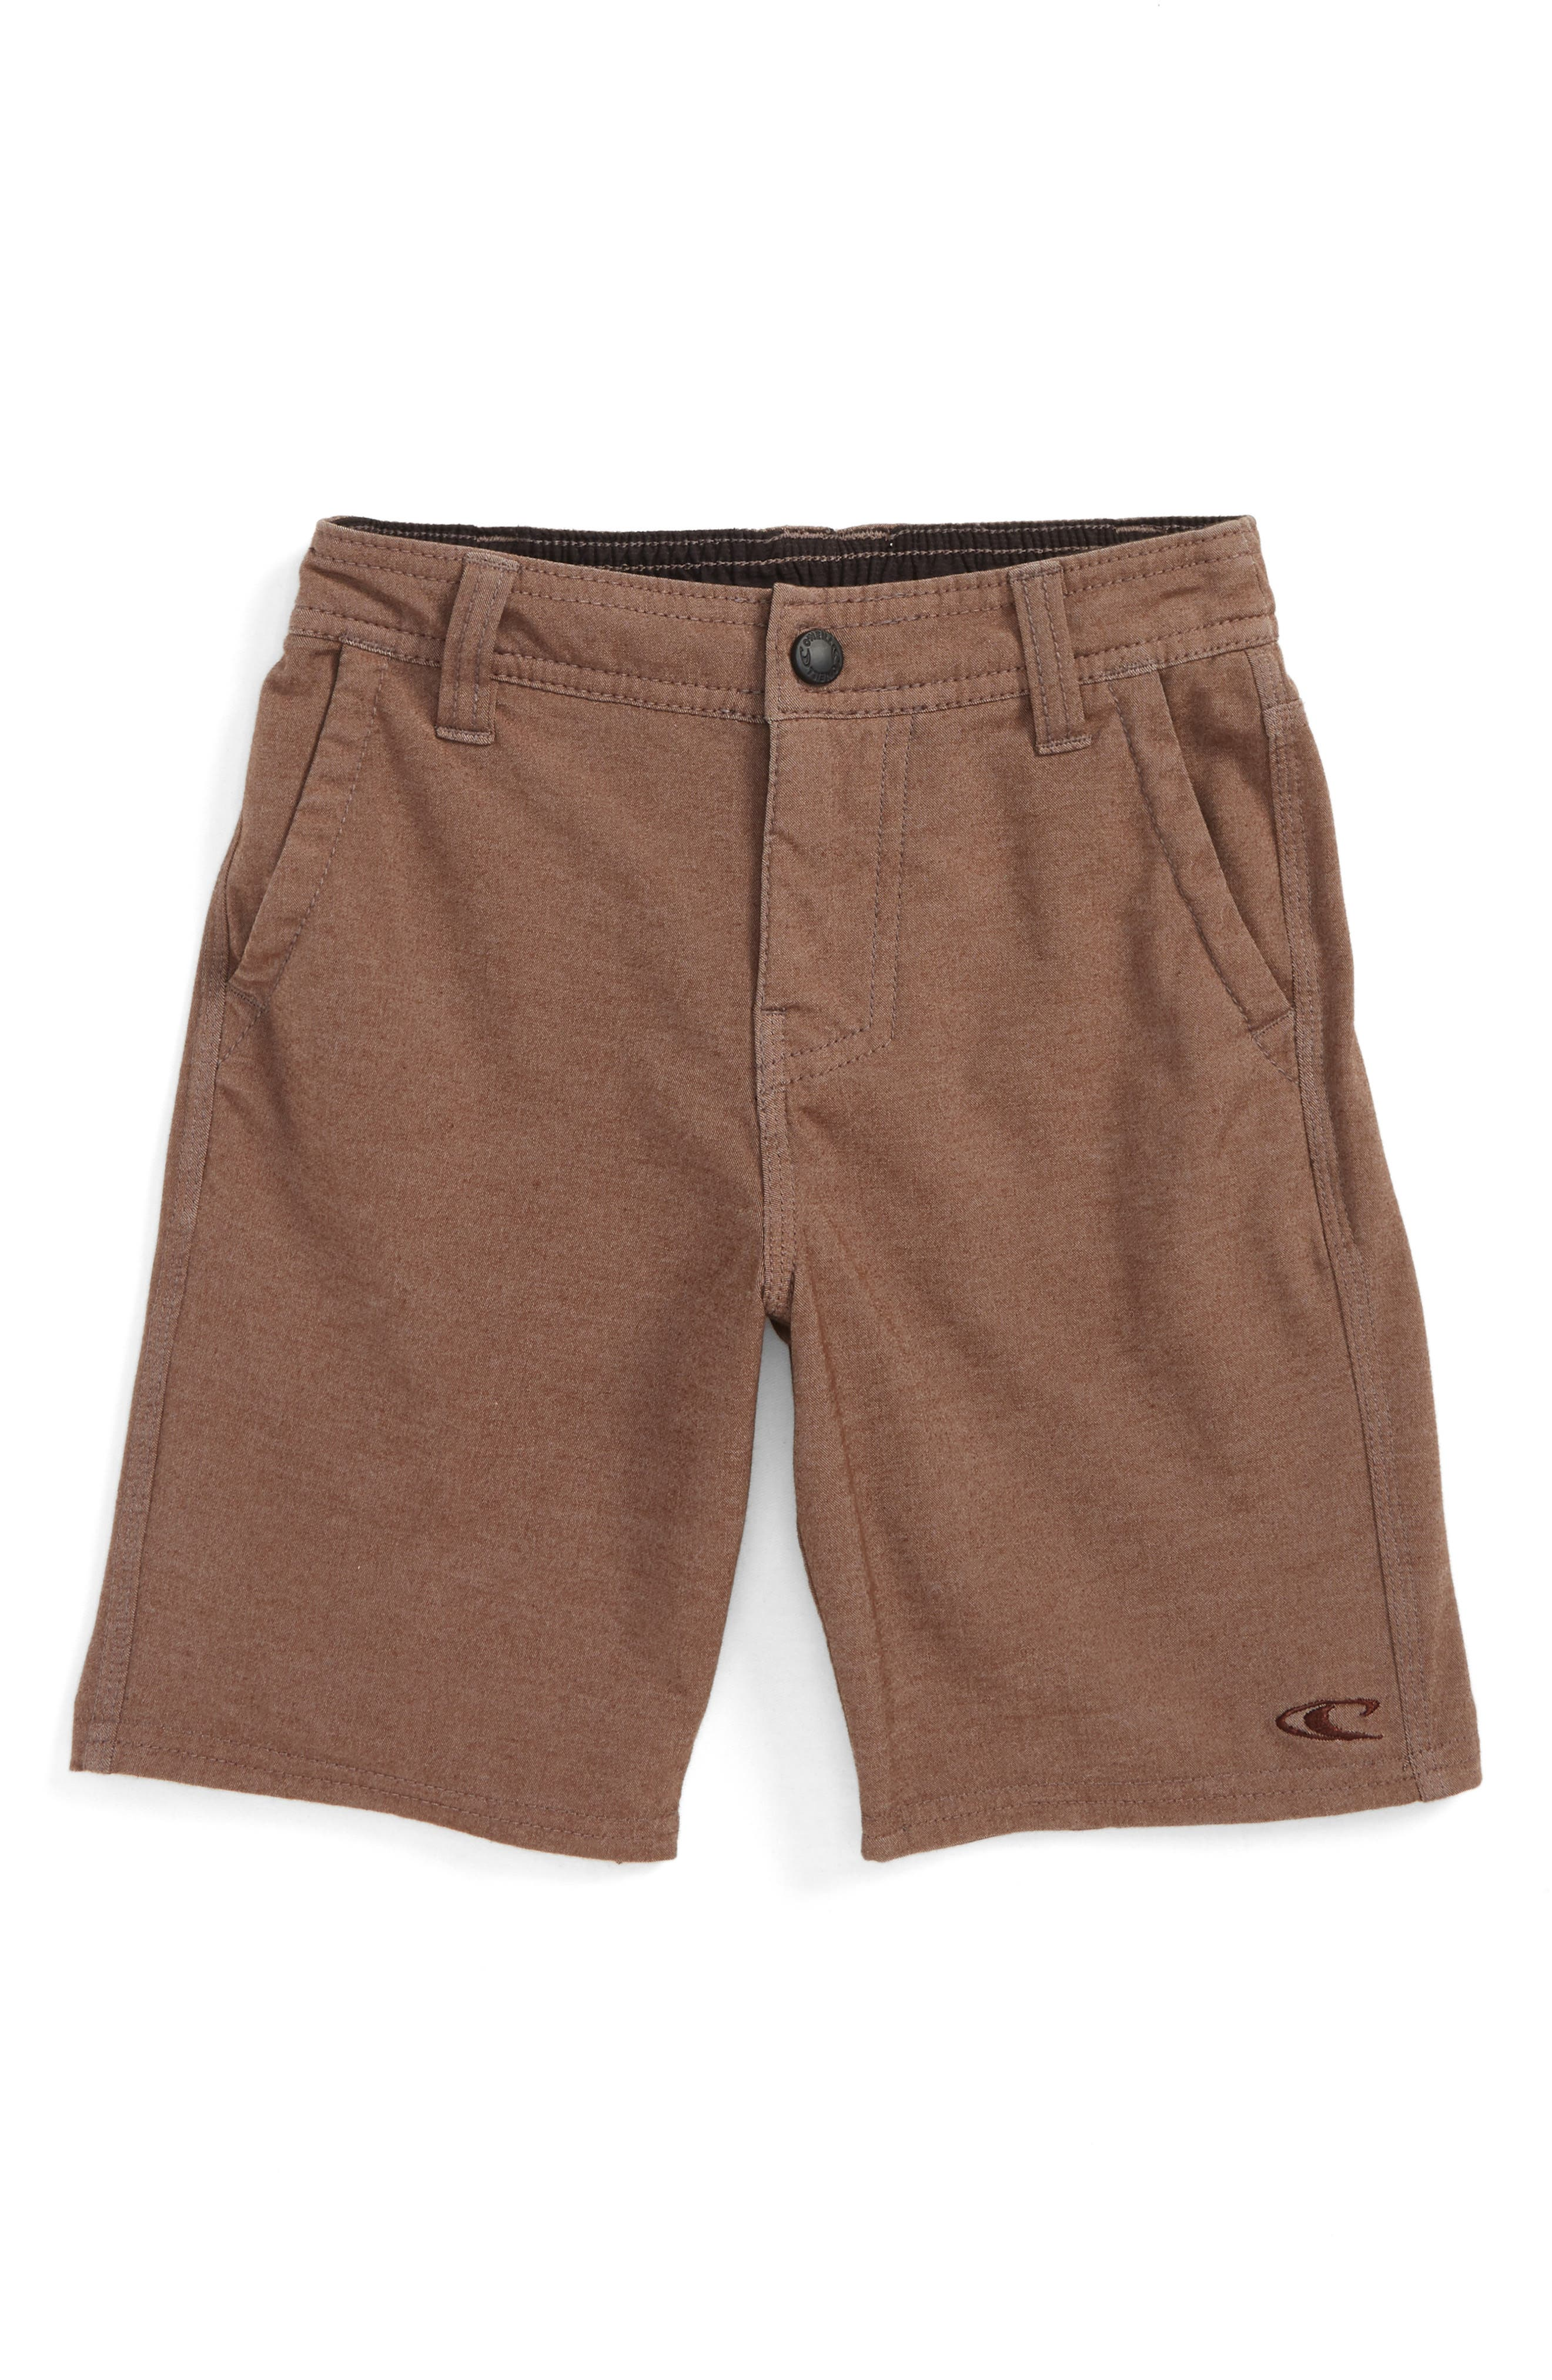 Locked Hybrid Board Shorts,                         Main,                         color, 216